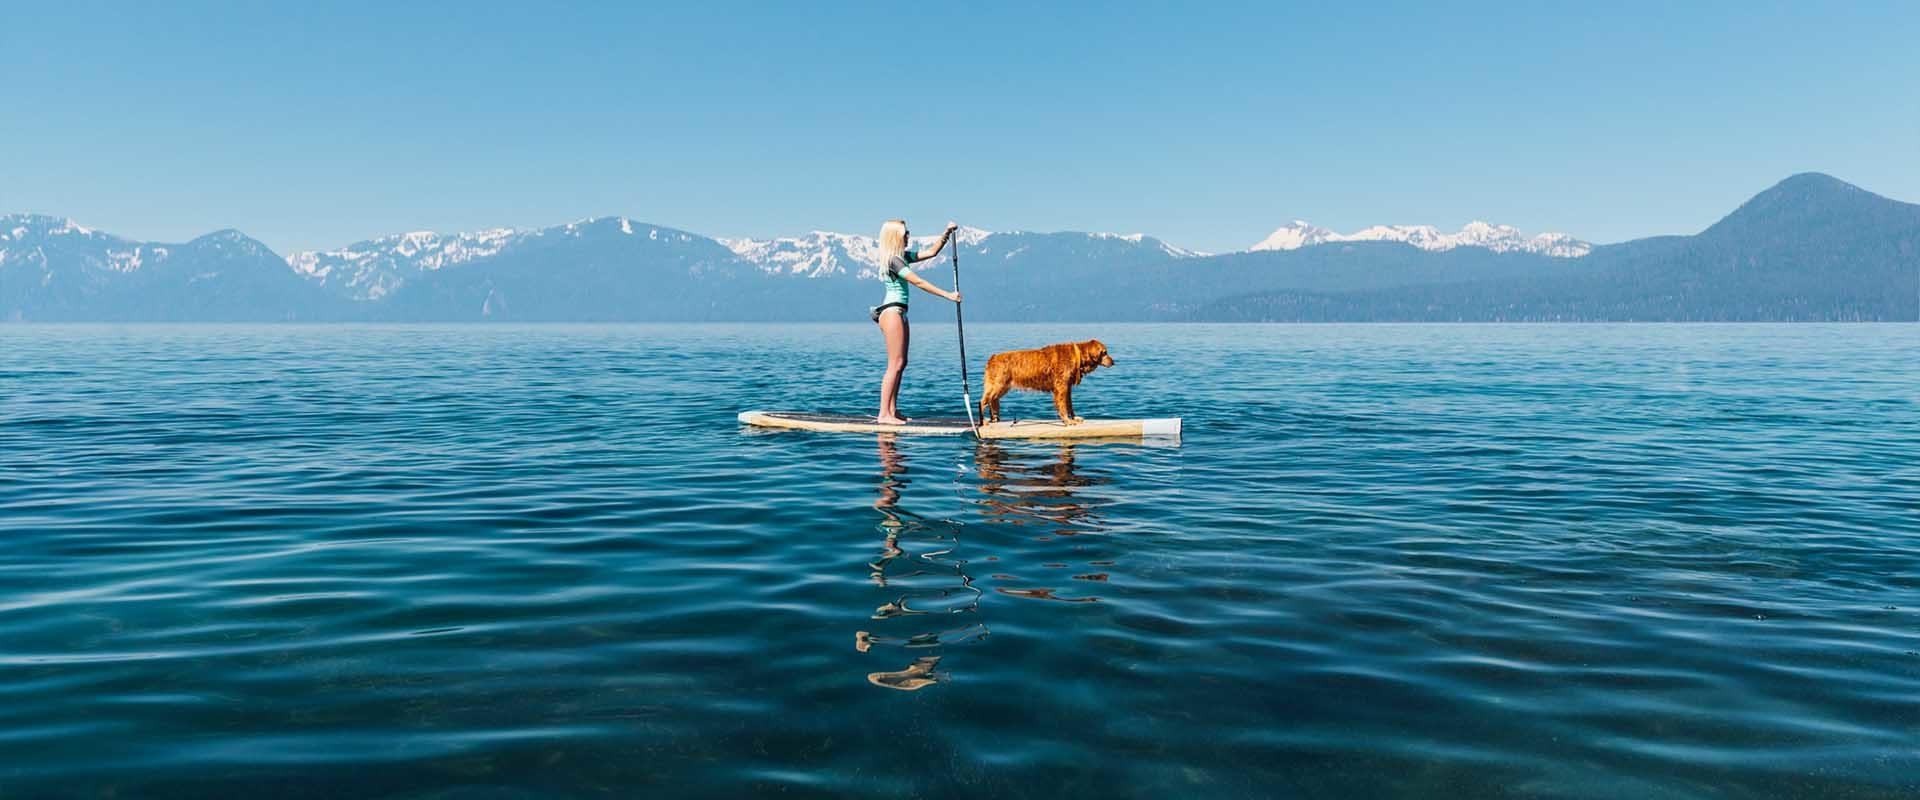 Hotels In Reno Lake Tahoe